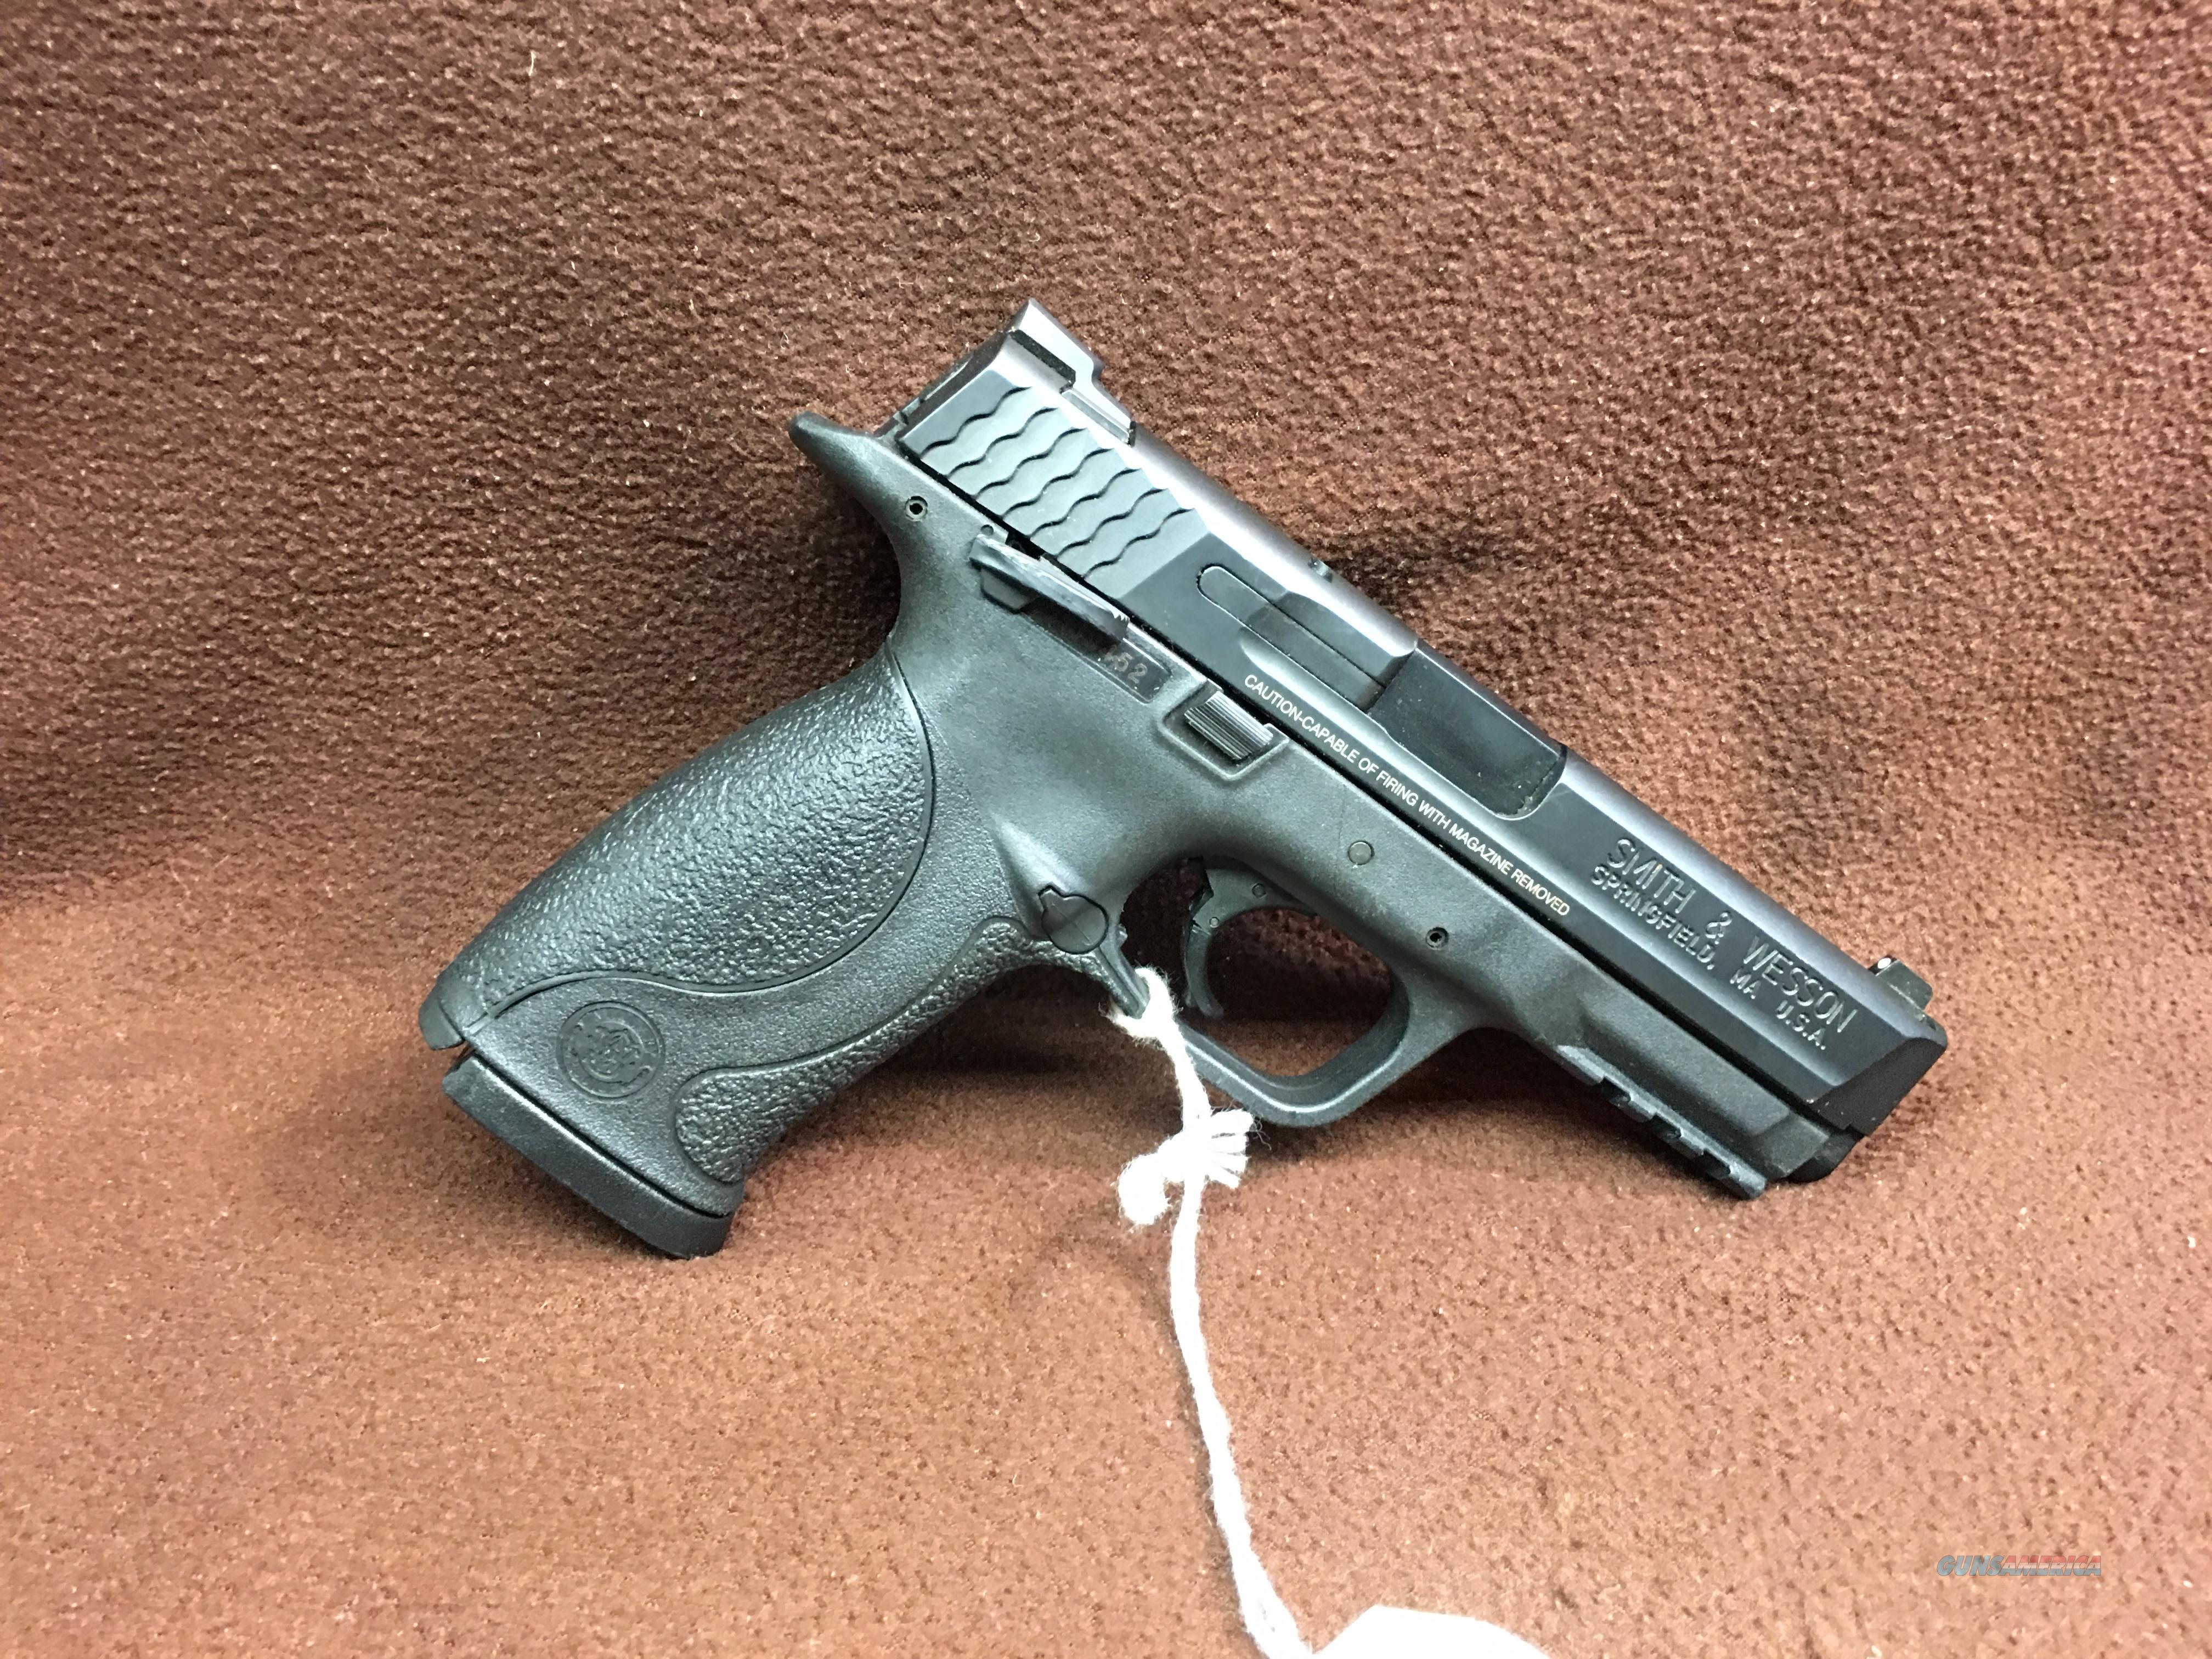 SMITH WESSON M&P   40 CALIBER  Guns > Pistols > Smith & Wesson Pistols - Autos > Polymer Frame